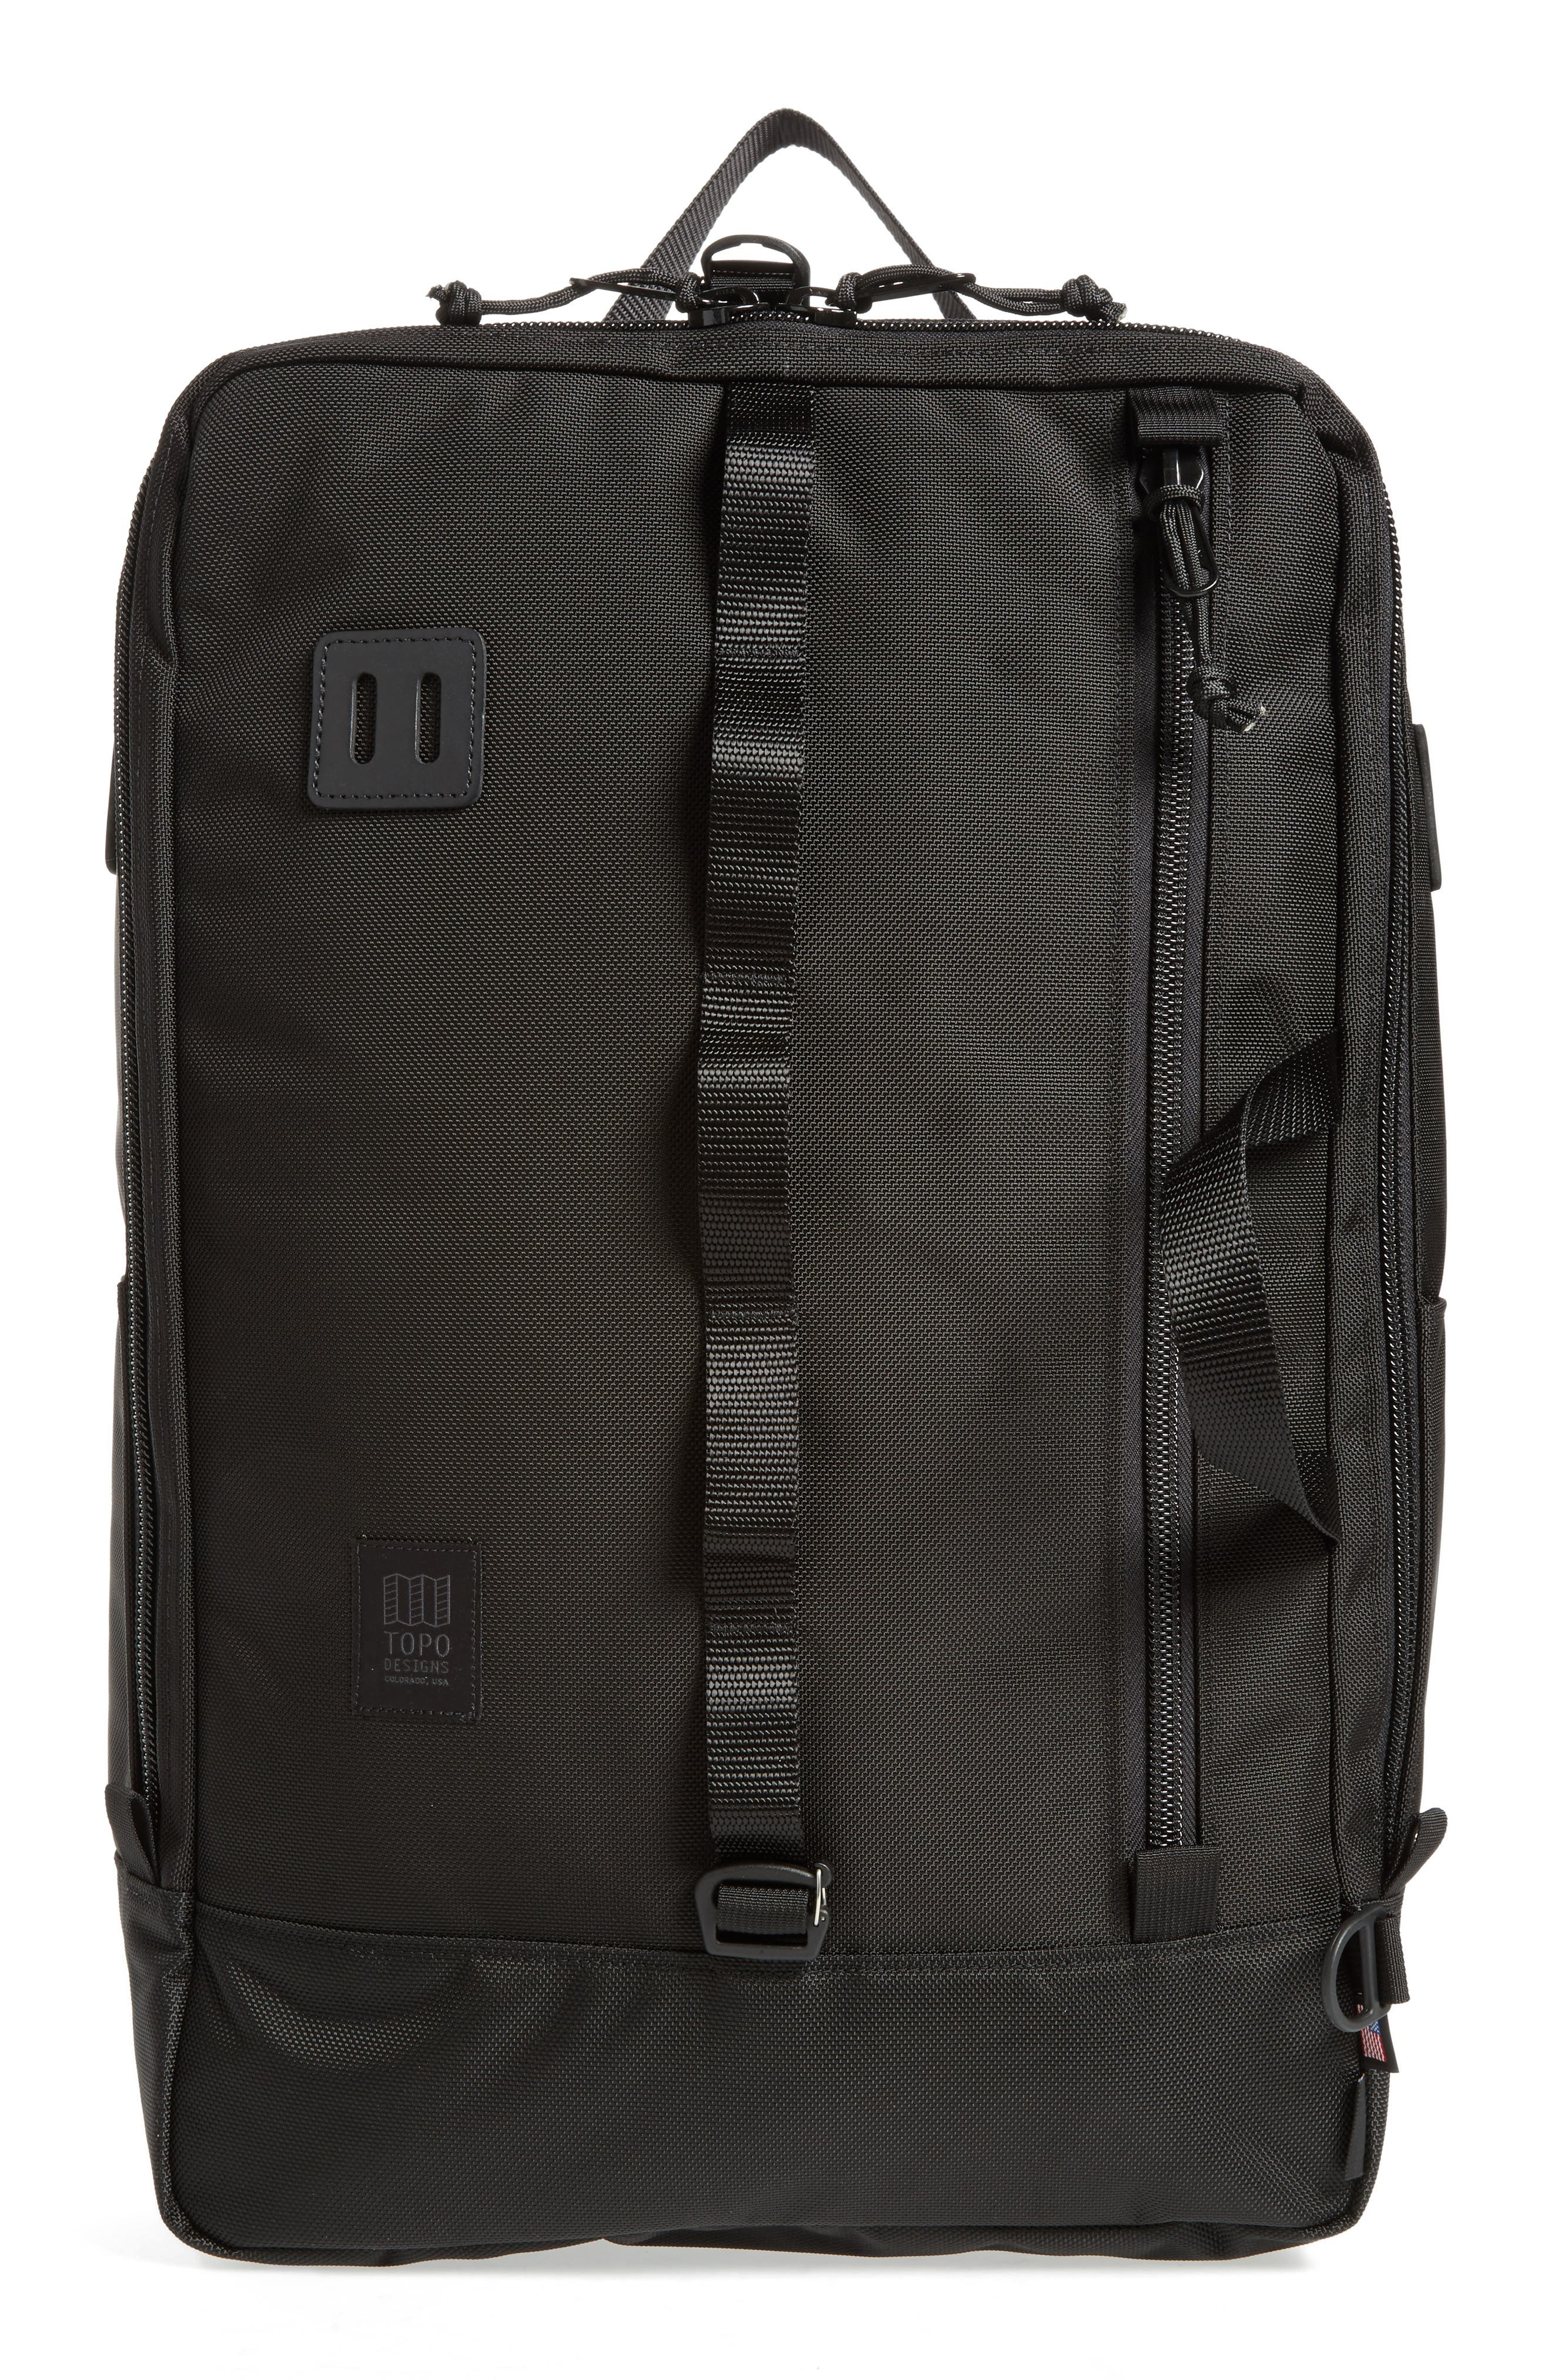 Travel Backpack,                             Main thumbnail 1, color,                             BALLISTIC BLACK